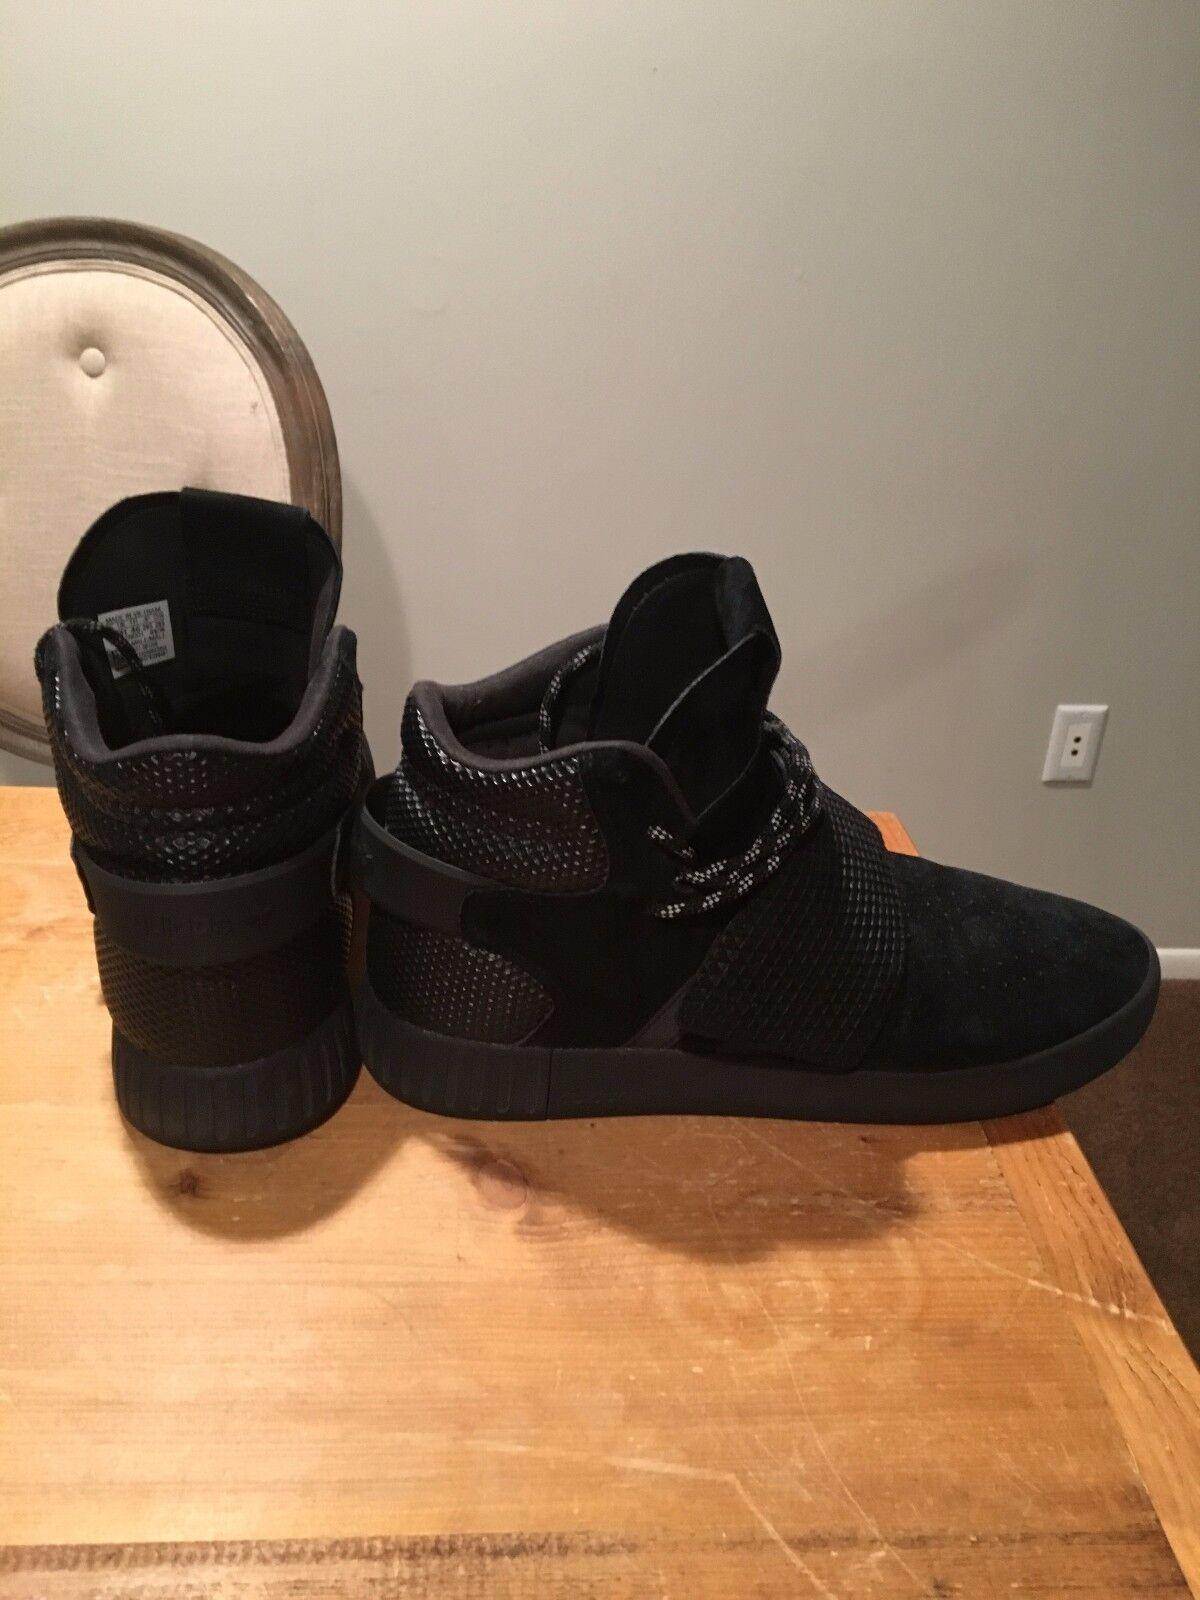 Adidas Tubular High all Black